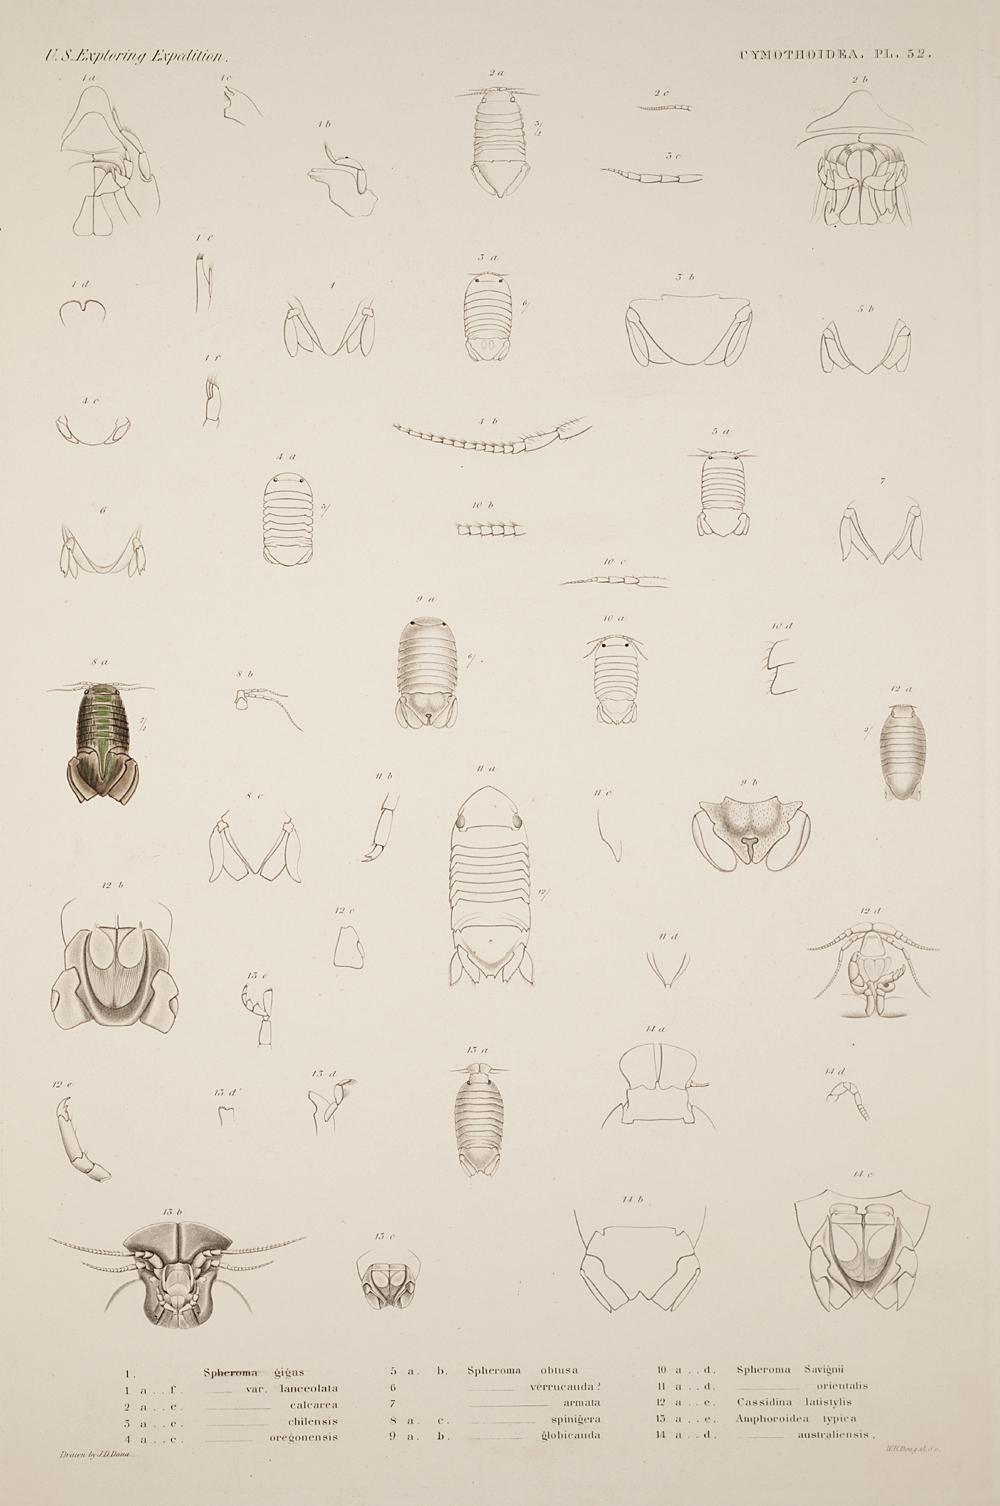 Cymothoidea. Pl. 52,  Image number:SIL19-21-137b